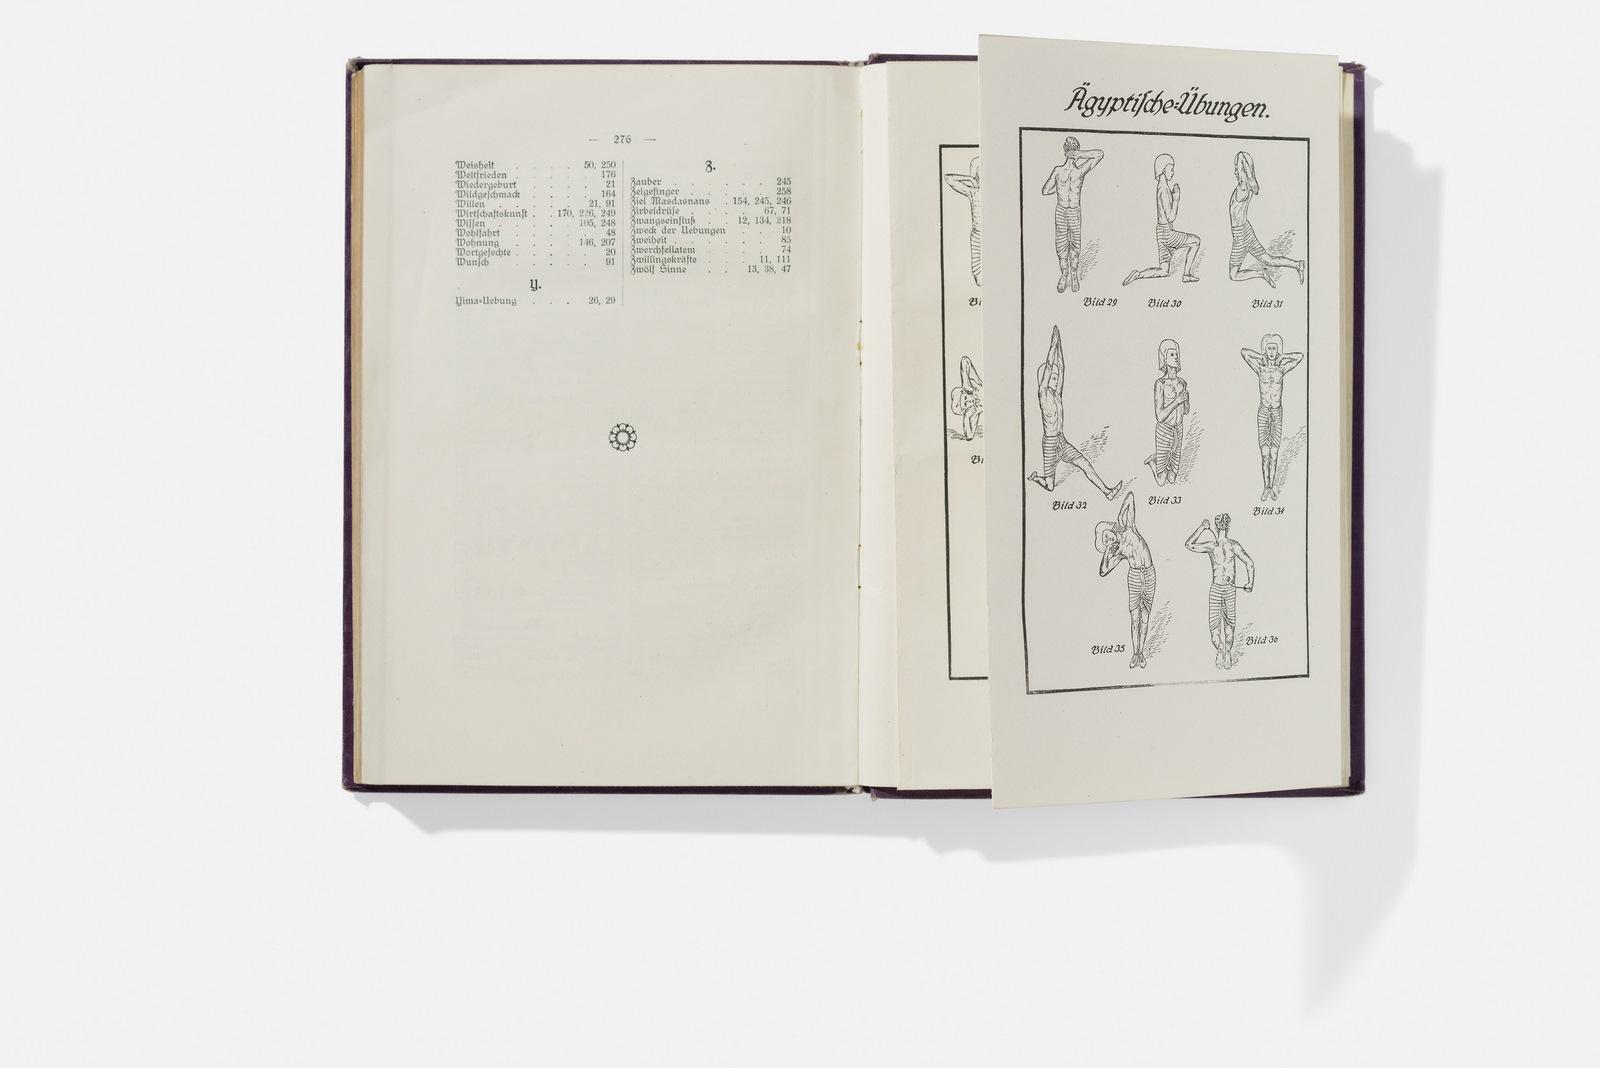 O. Z. Hanish & David Ammann, Masdasnan – Lecciones de respiración, 1919 Foto: A. Körner (bildhübsche Fotografie) / Gentileza ifa